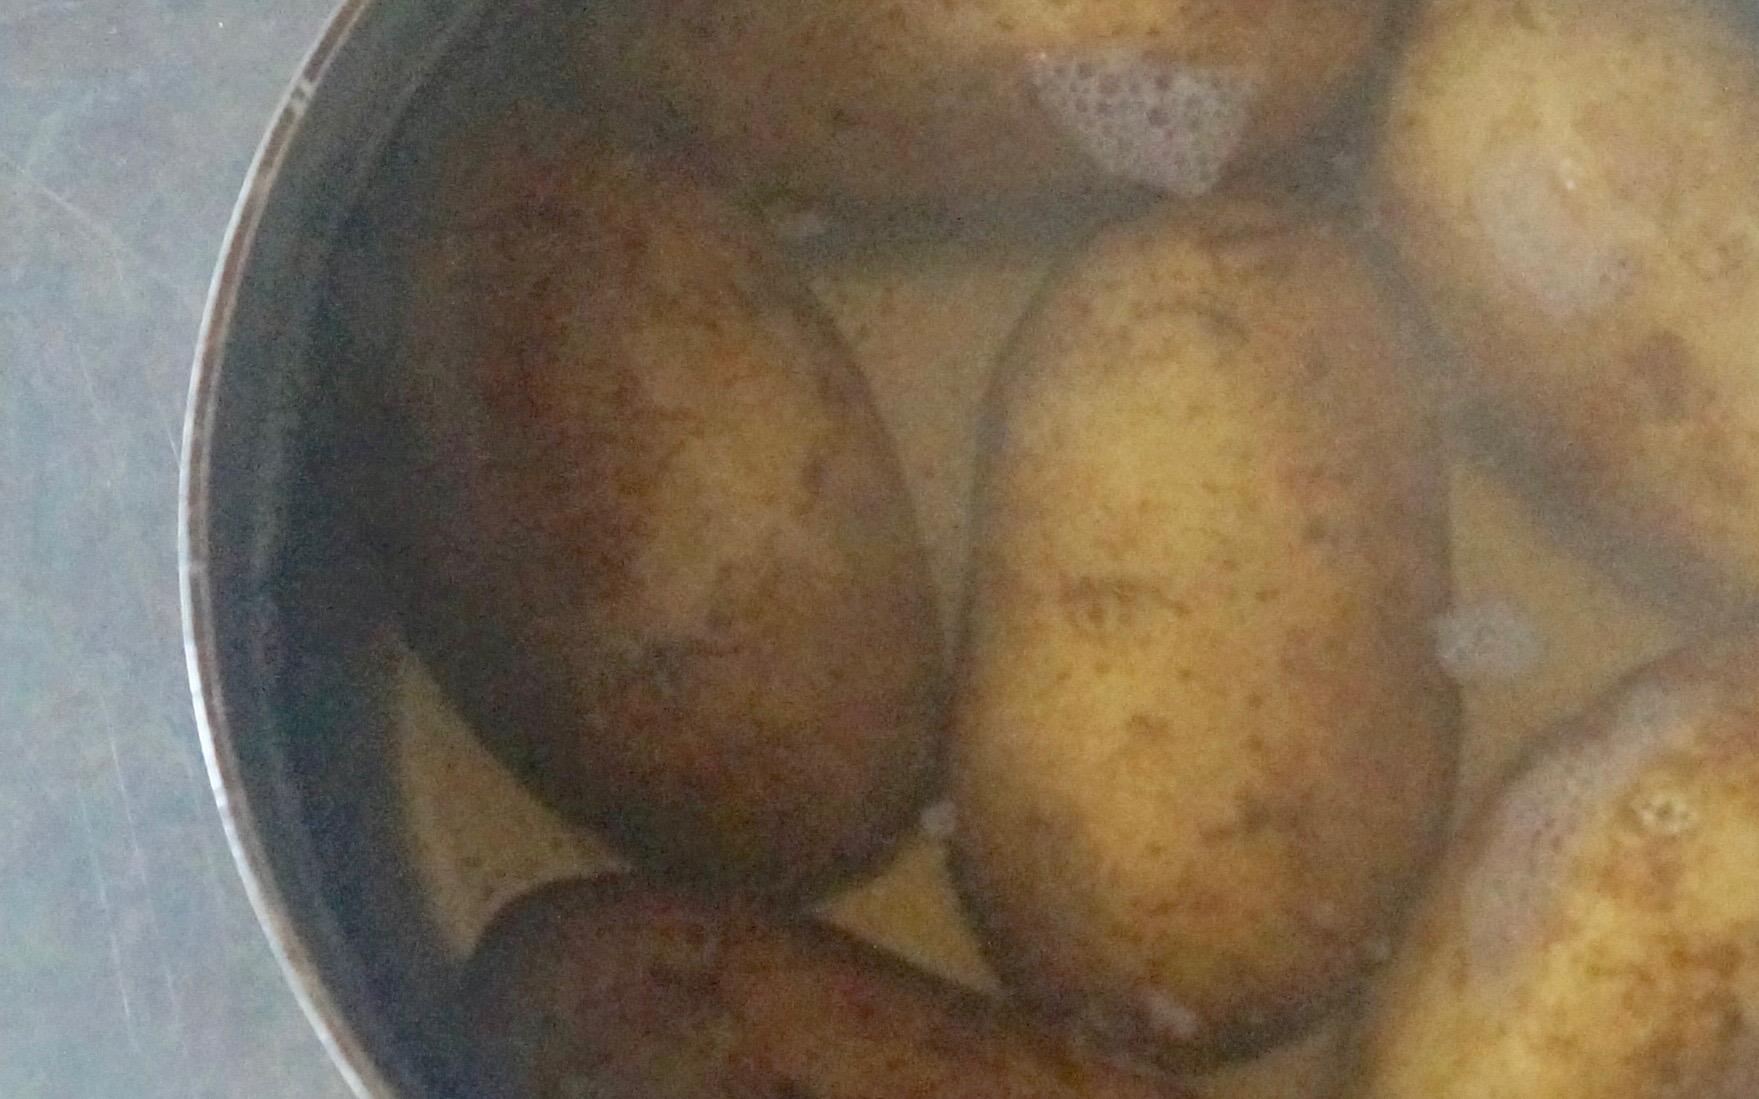 How-Do-You-Make-Potato-Salad-Rebecca-Gordon-Editor-In-Chief-Buttermilk-Lipstick-Culinary-Entertaining-Techniques-Southern-Hostess-RebeccaGordon-Pastry-Chef-Birmingham-Alabama